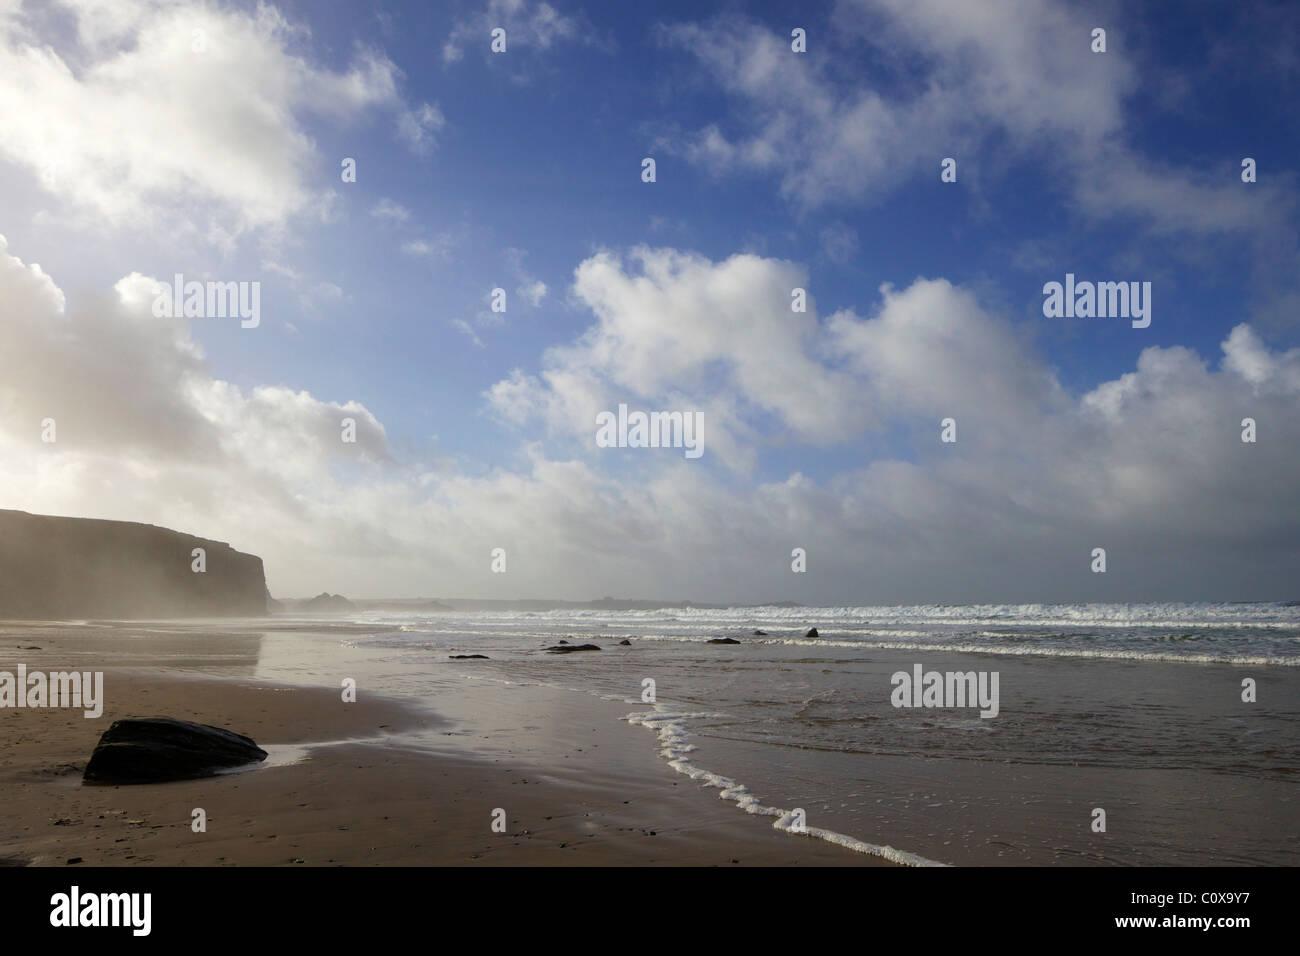 Beach at Watergate Bay, Newquay, Cornwall, South West England, UK, United Kingdom, GB, Great Britain, British Isles, - Stock Image